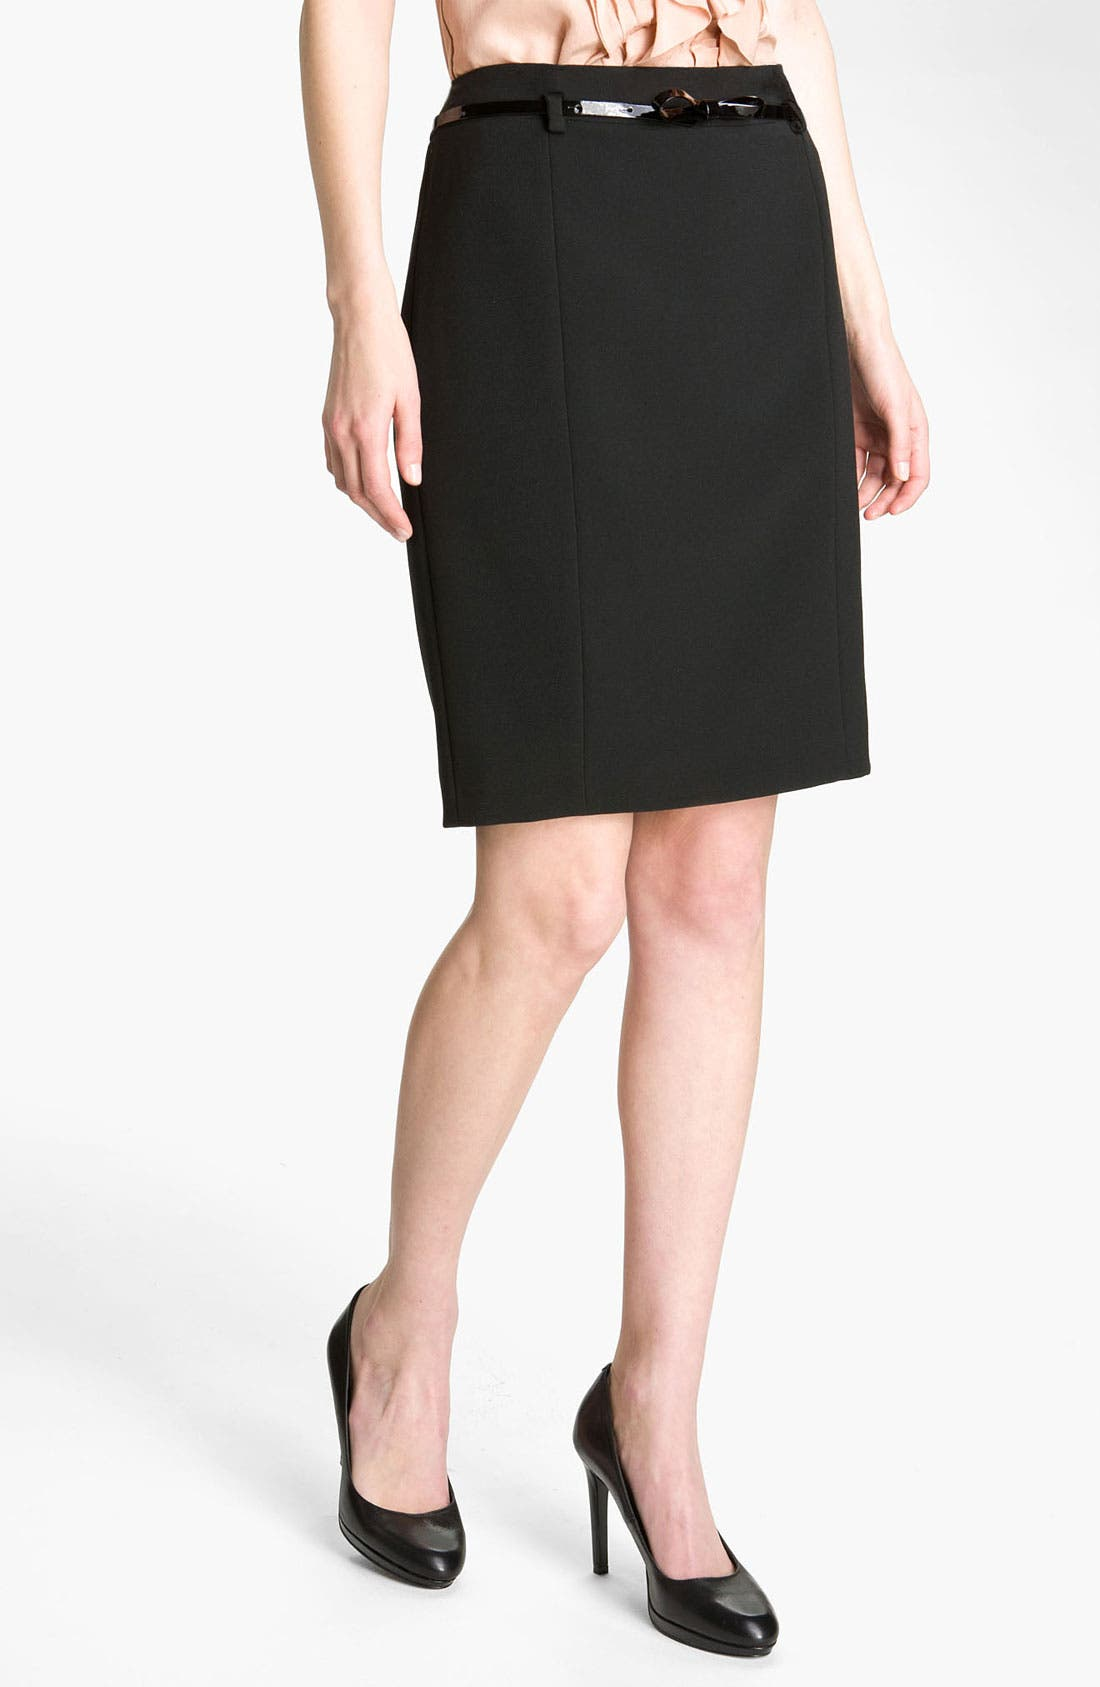 Alternate Image 1 Selected - Weekend Max Mara 'Medusa' Skirt